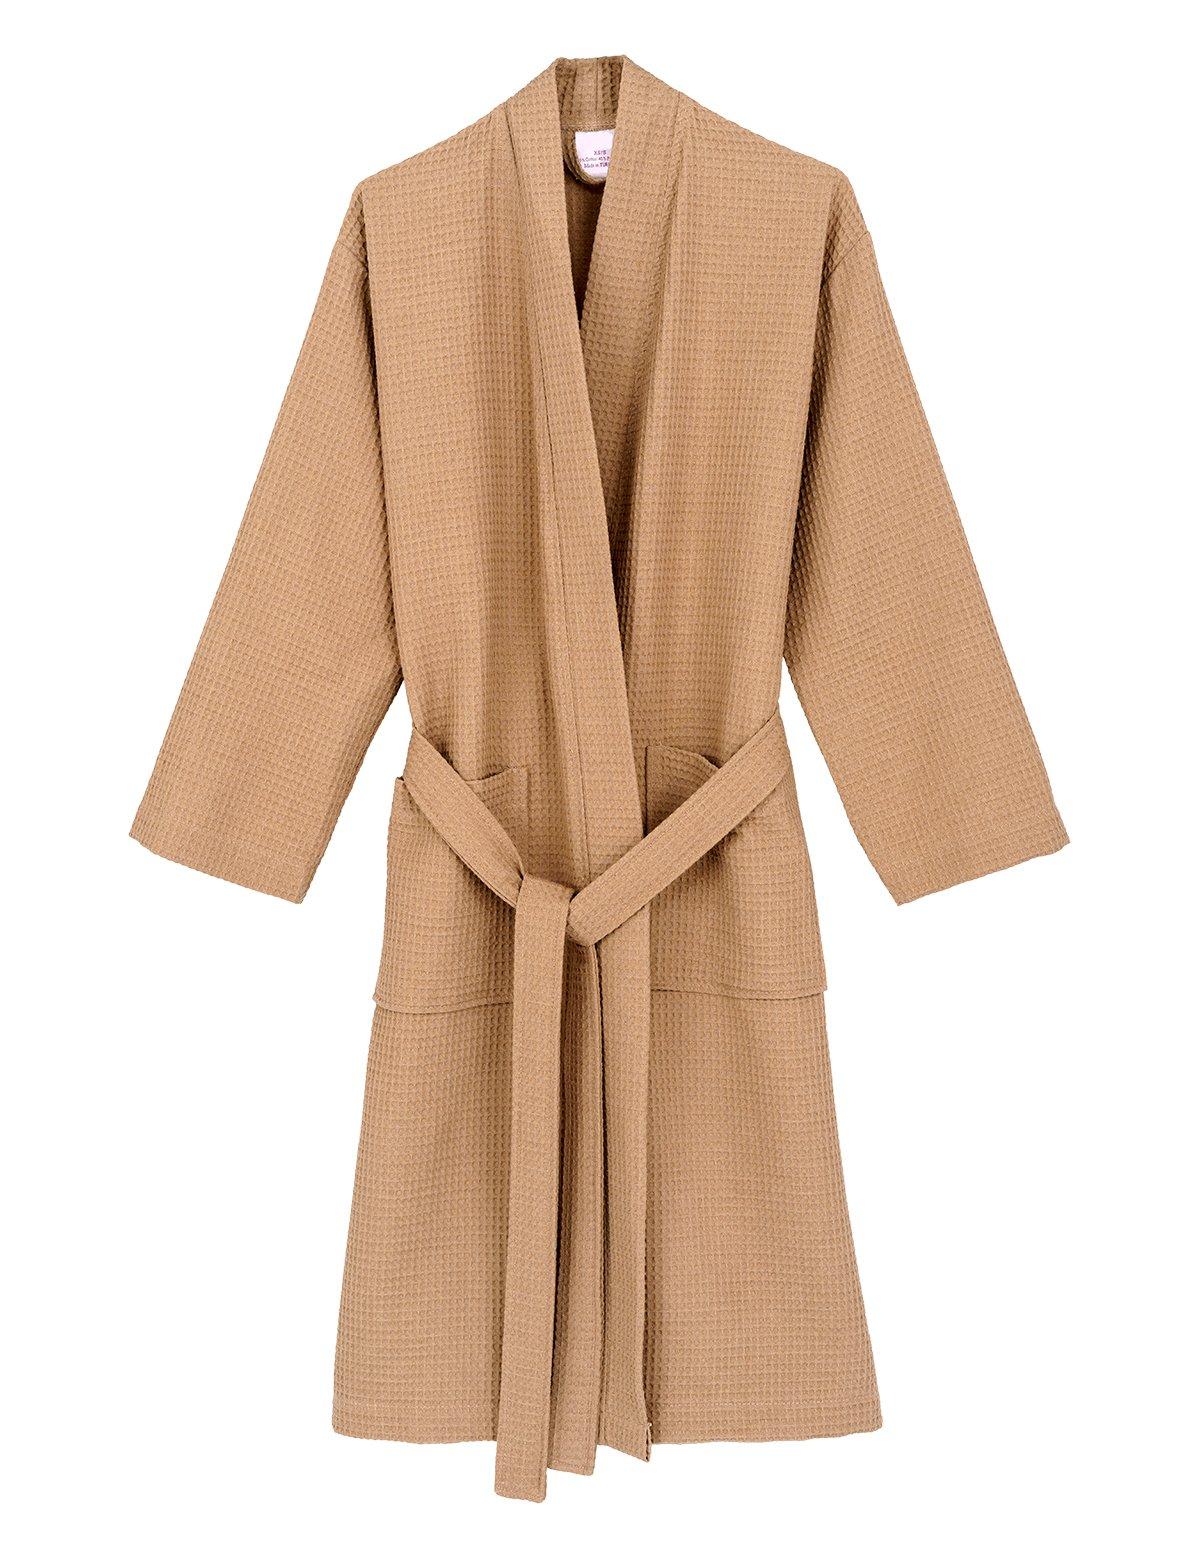 TowelSelections Women's Robe, Kimono Waffle Spa Bathrobe X-Small/Small Warm Taupe